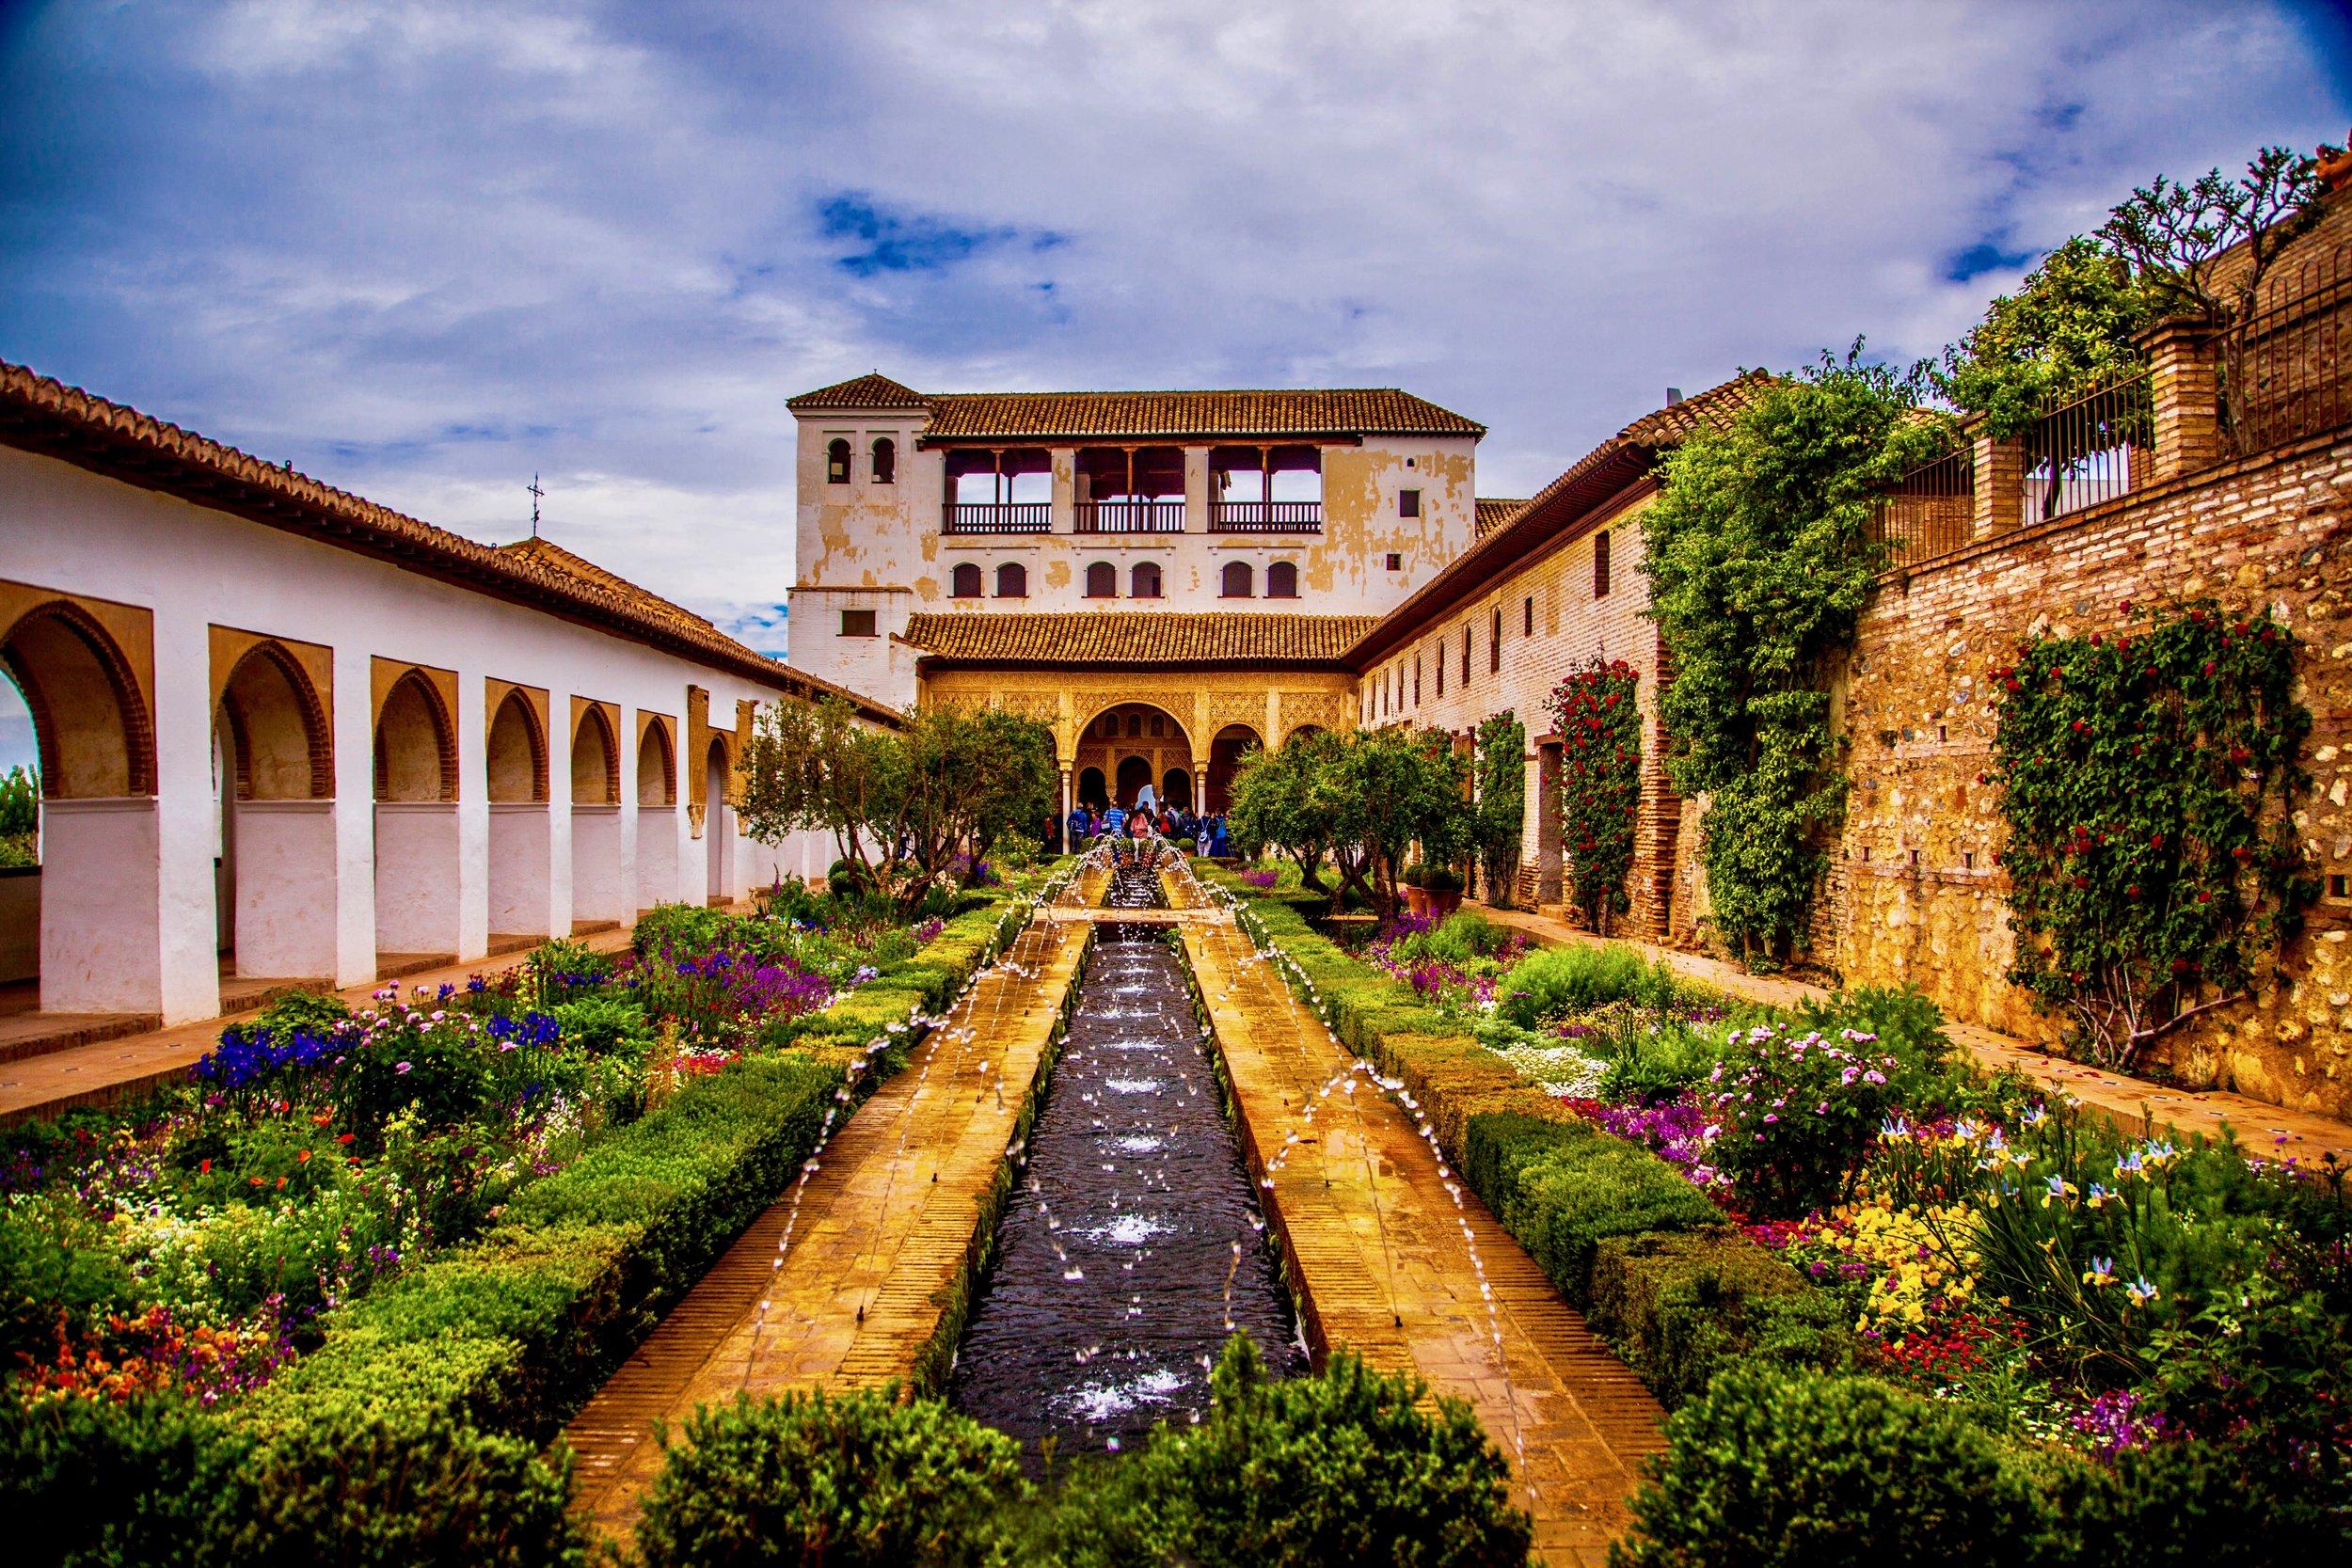 Alhambra 9 10.53.06 AM.jpg